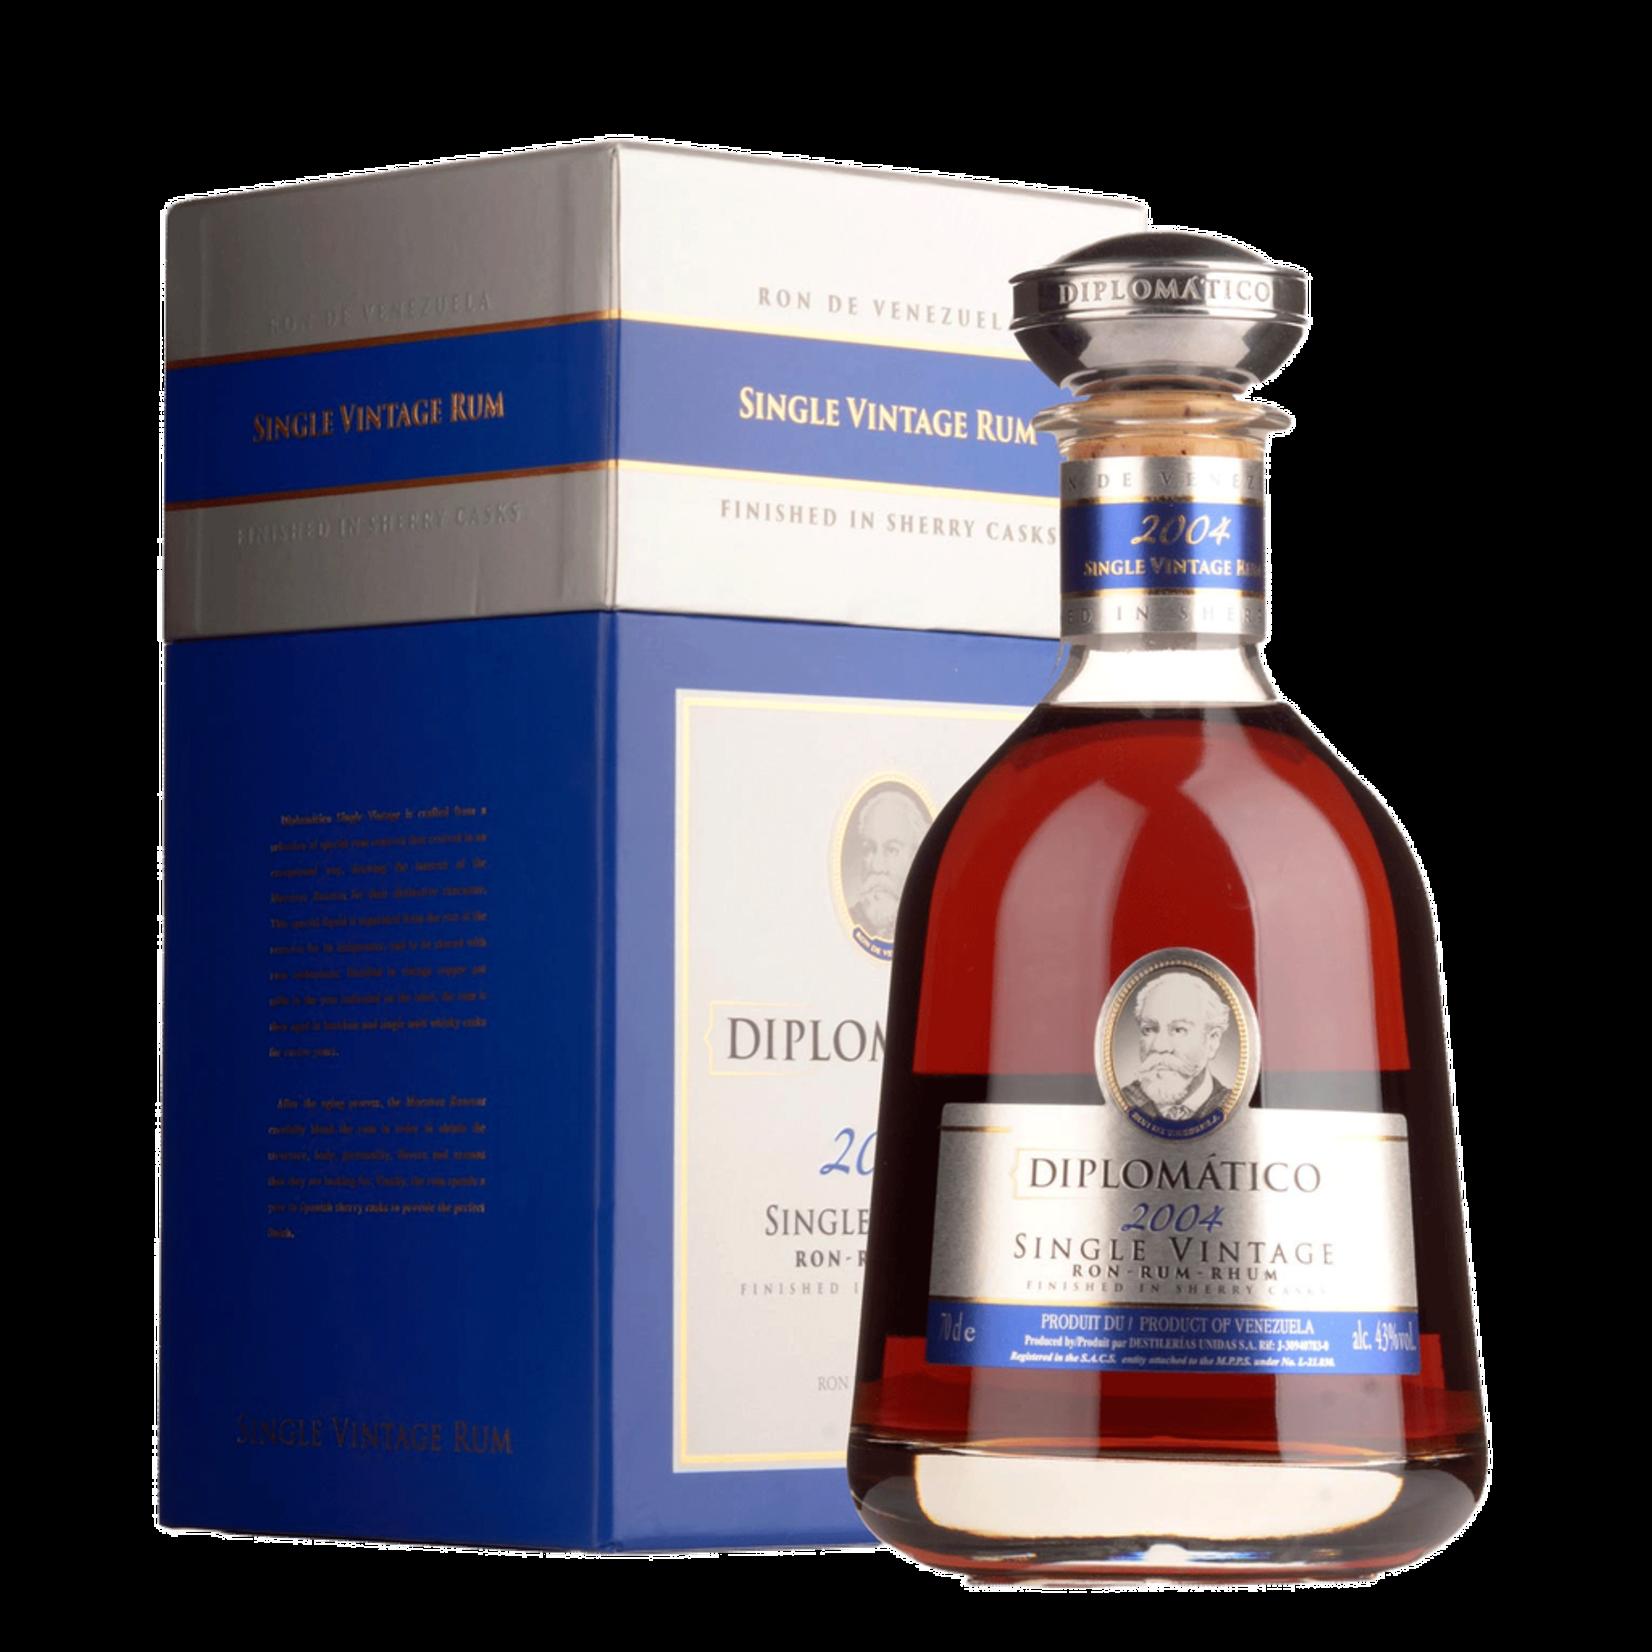 Spirits Diplomatico Single Vintage 2004 Rum